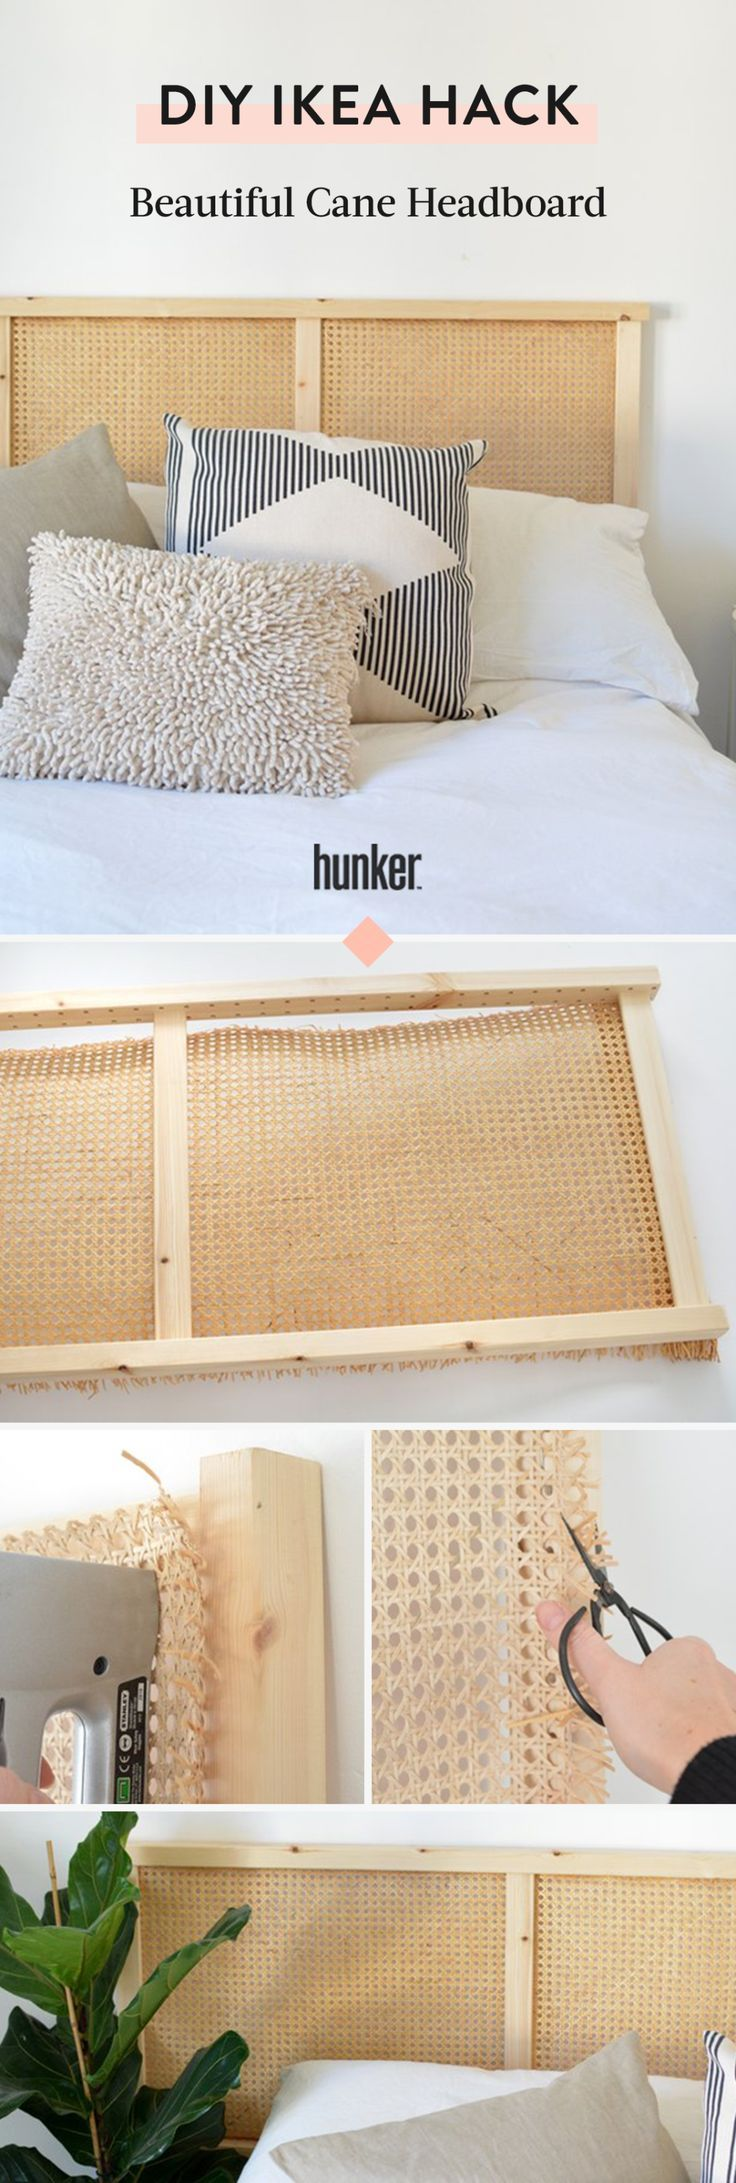 This Utilitarian IKEA Piece Gets Transformed Into a Beautiful Cane Headboard | Hunker